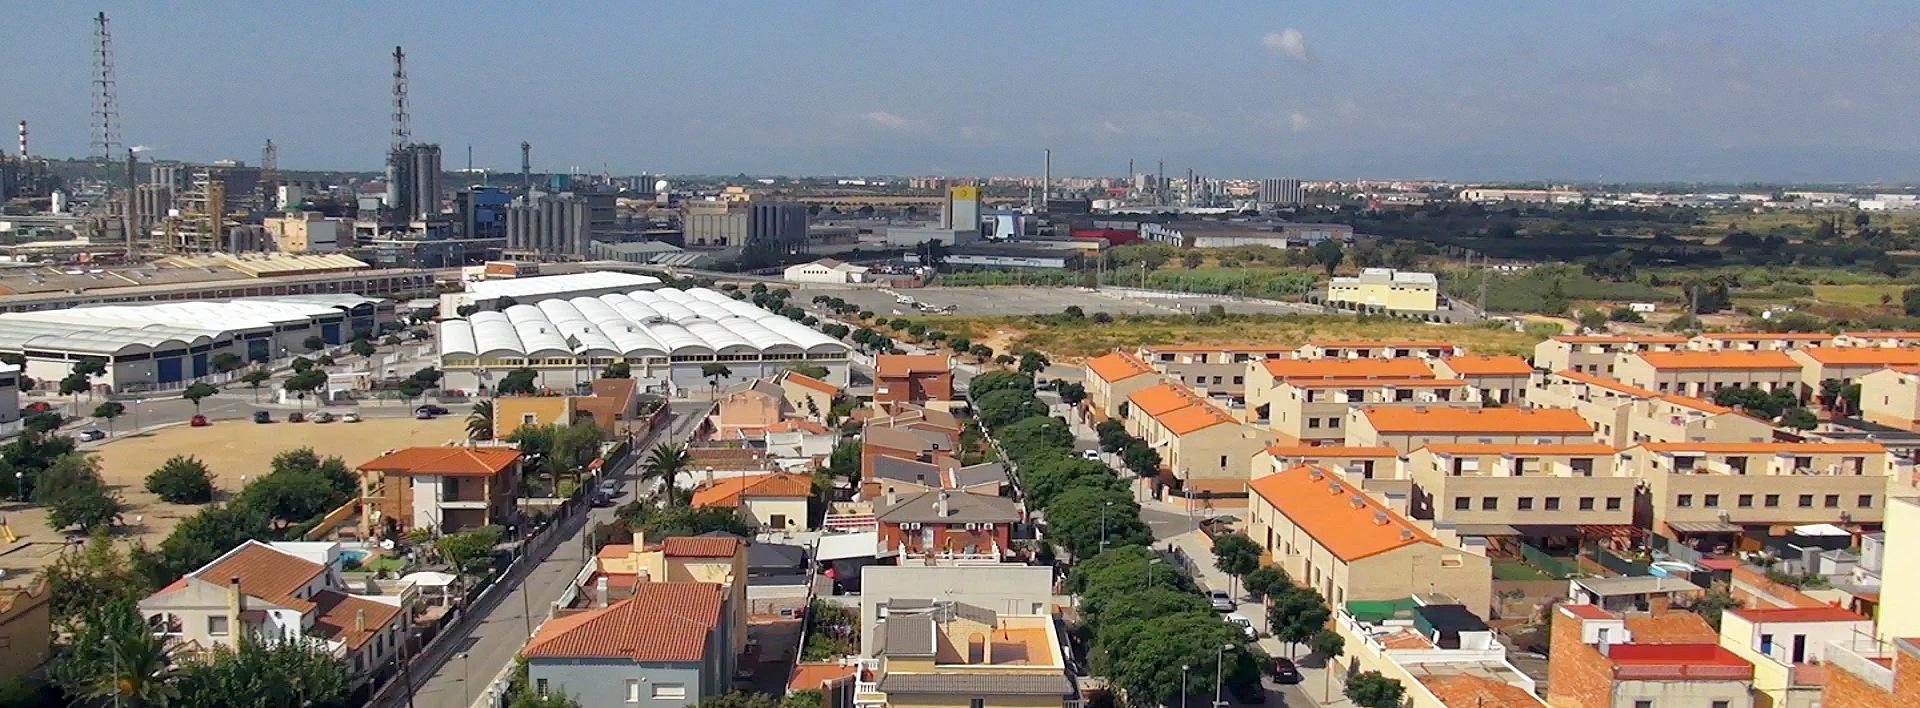 foto aérea urbanizaciones